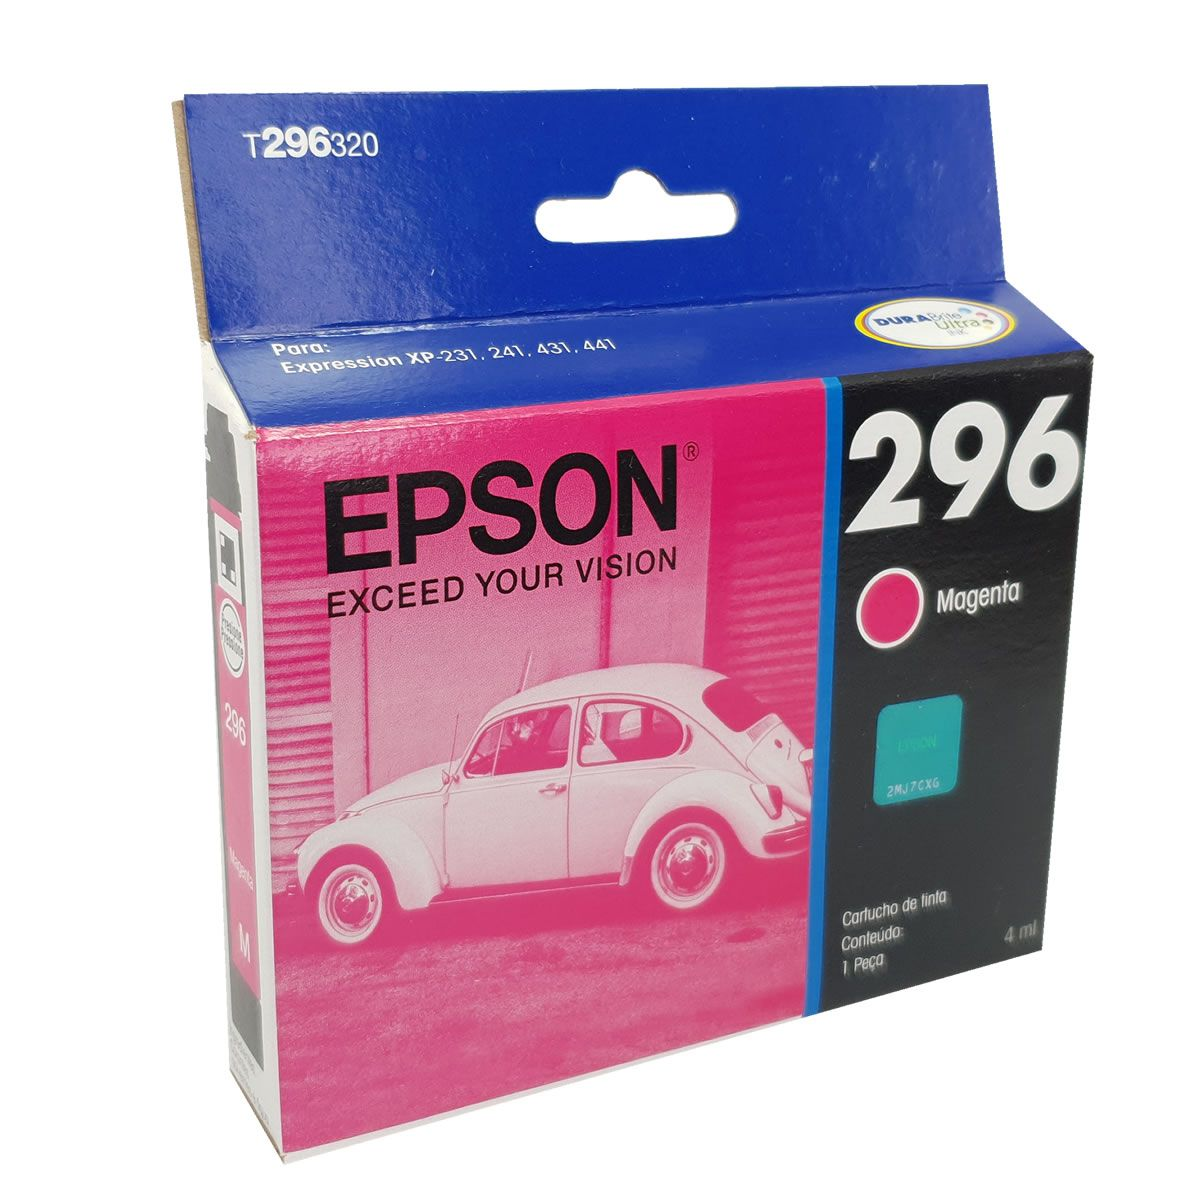 Cartucho EPSON 296 T296320 Magenta para XP-231 431 T296 TO296 T0296